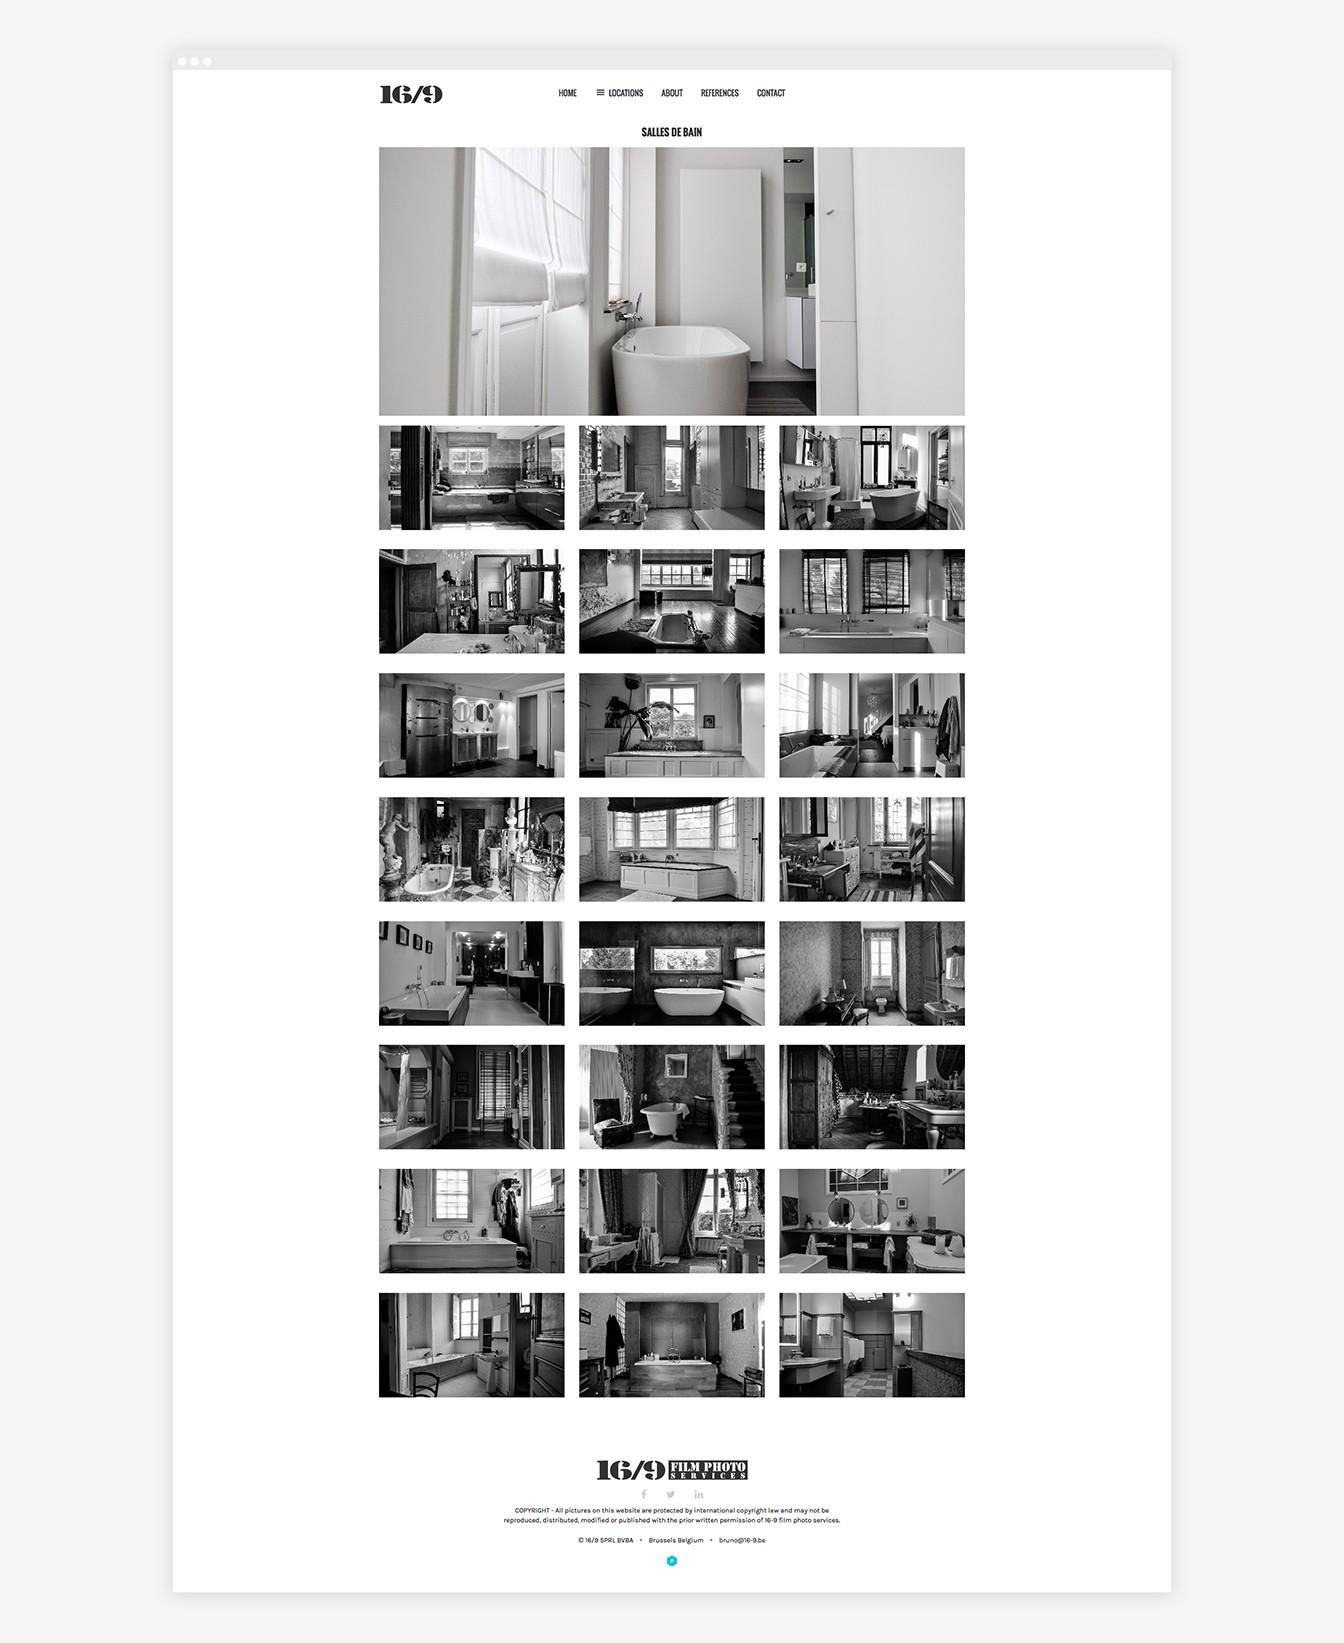 03-bruno-pradez-web-pikteo-webdesign-graphic-design-freelance-paris-bruxelles-lyon